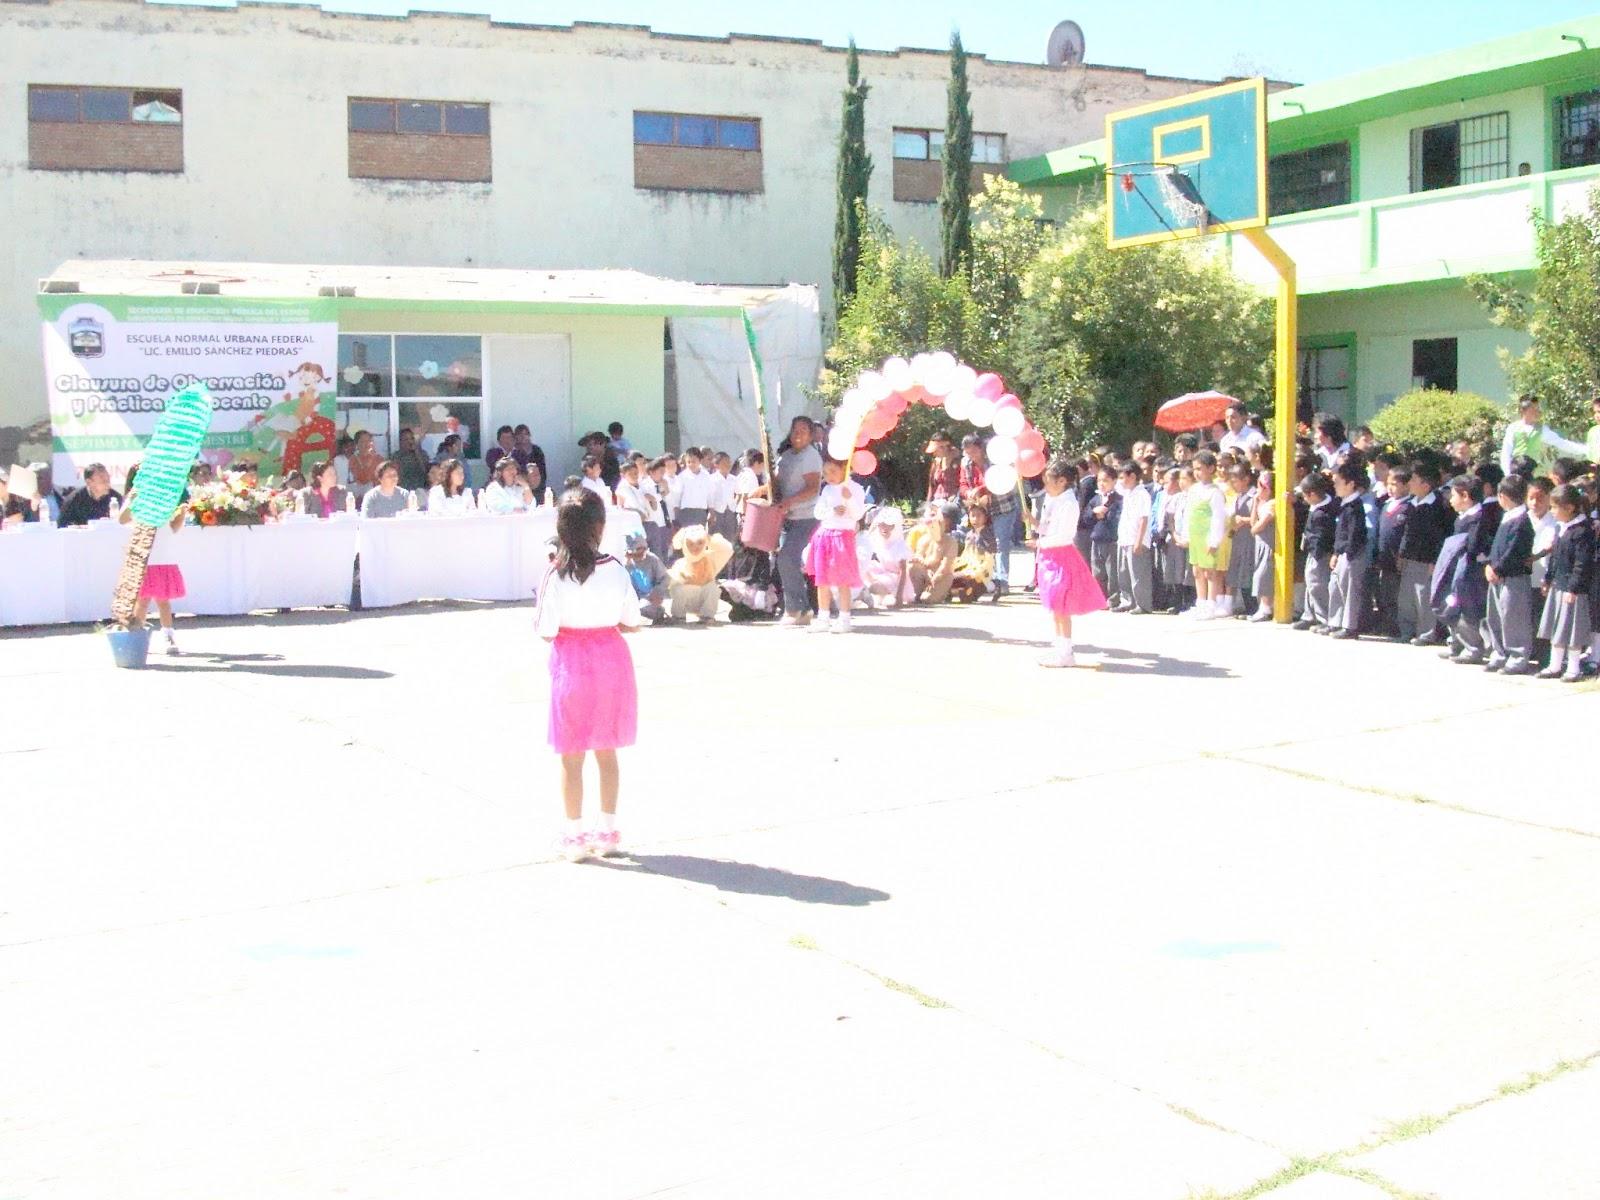 EL COMITÉ DE PADRES DE FAMILIA PARTICI P Ò EN LA DES P EDIDA